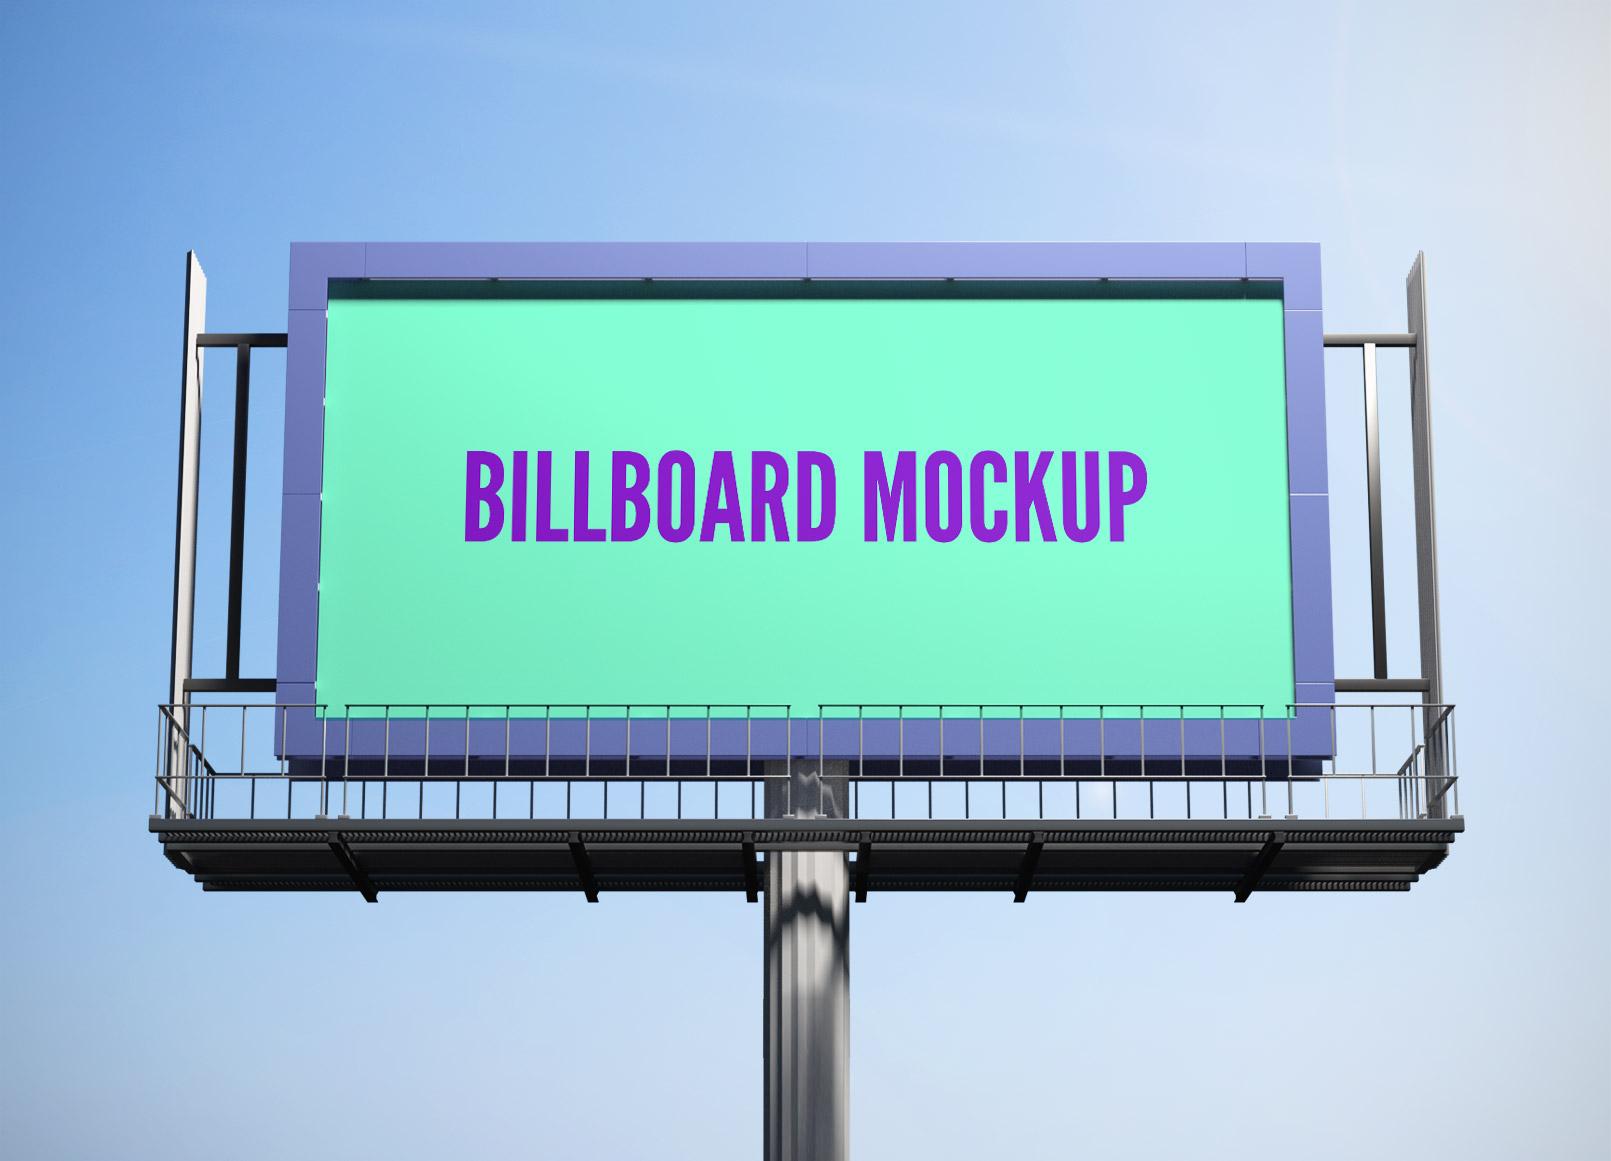 Free-Outdoor-Advertising-Billboard-Mockup-PSD-file